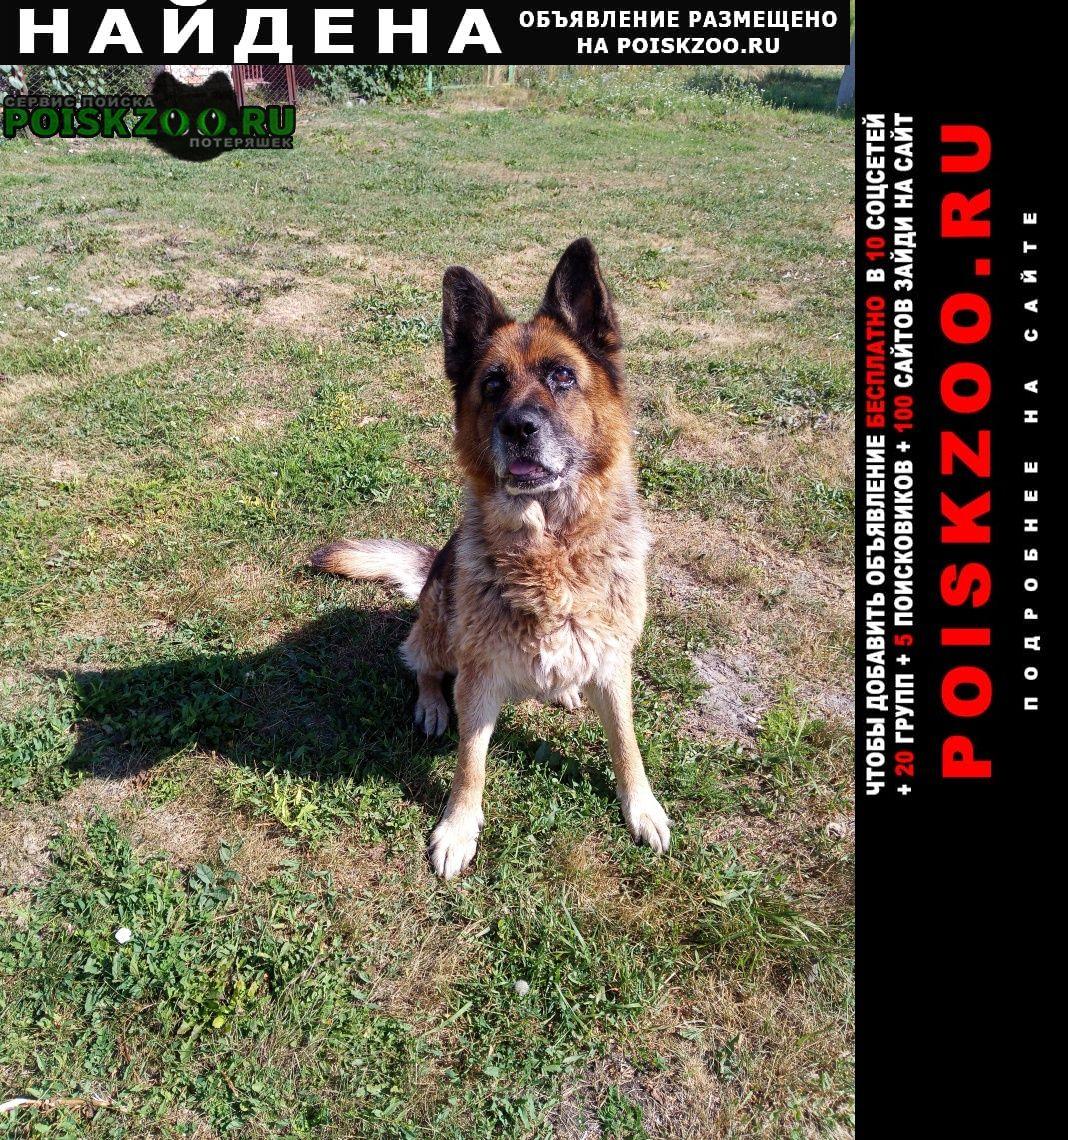 Найдена собака Тереньга